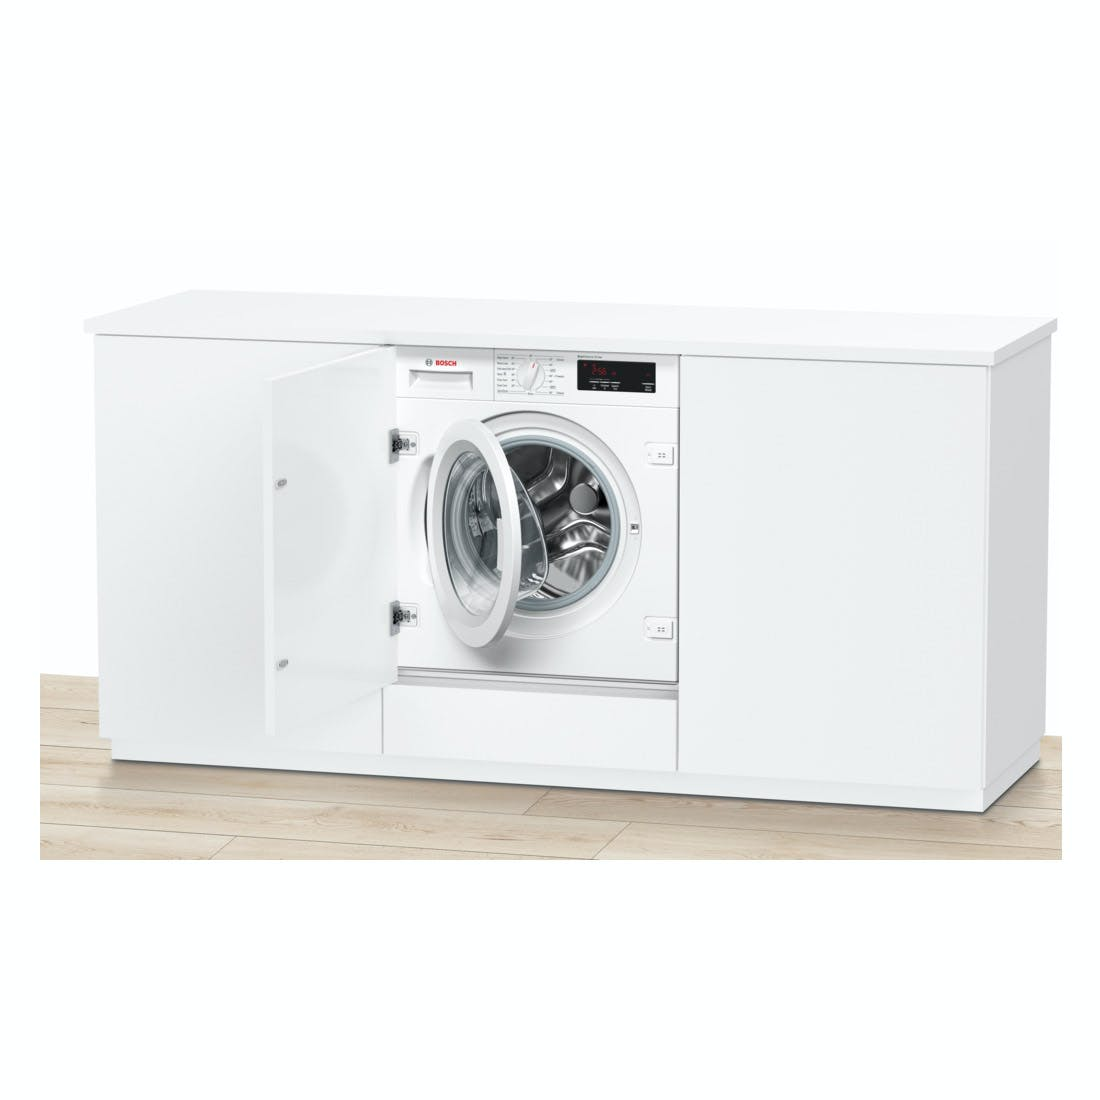 bosch wiw28300gb serie 6 integrated washing machine 1400rpm 8kg a